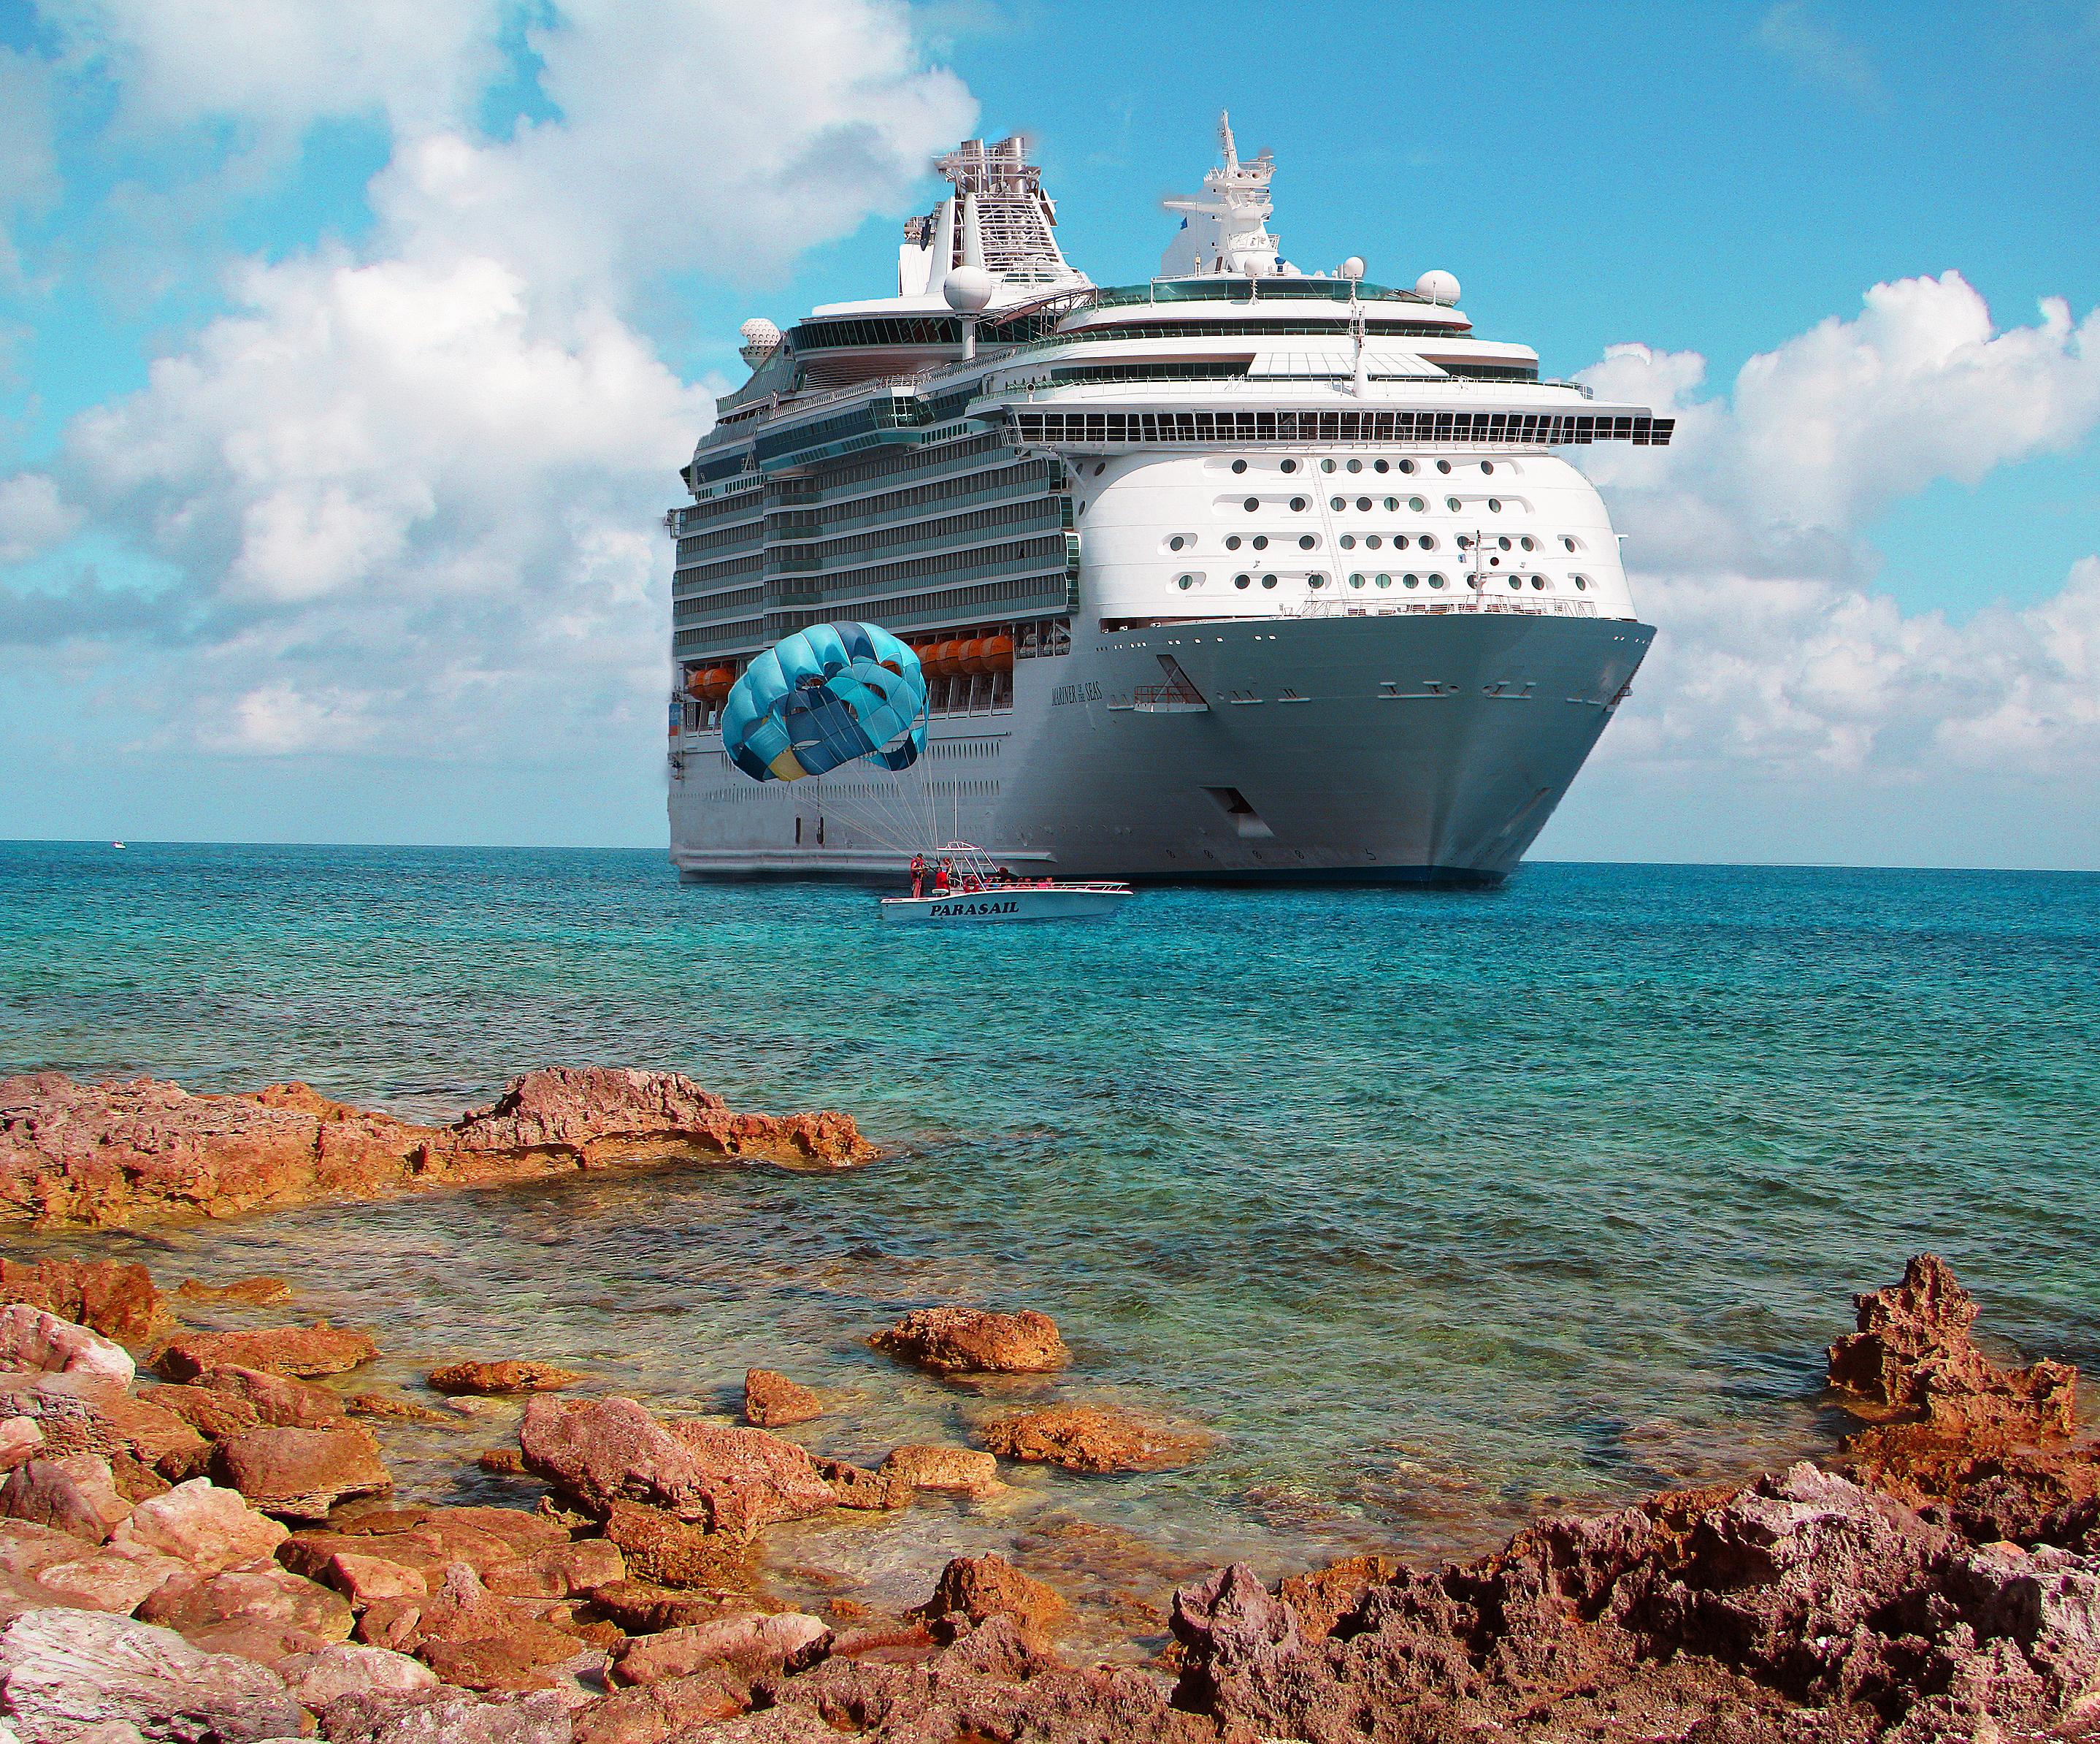 File:Mariner of the Seas in the Caribbean.jpg - Wikimedia ...